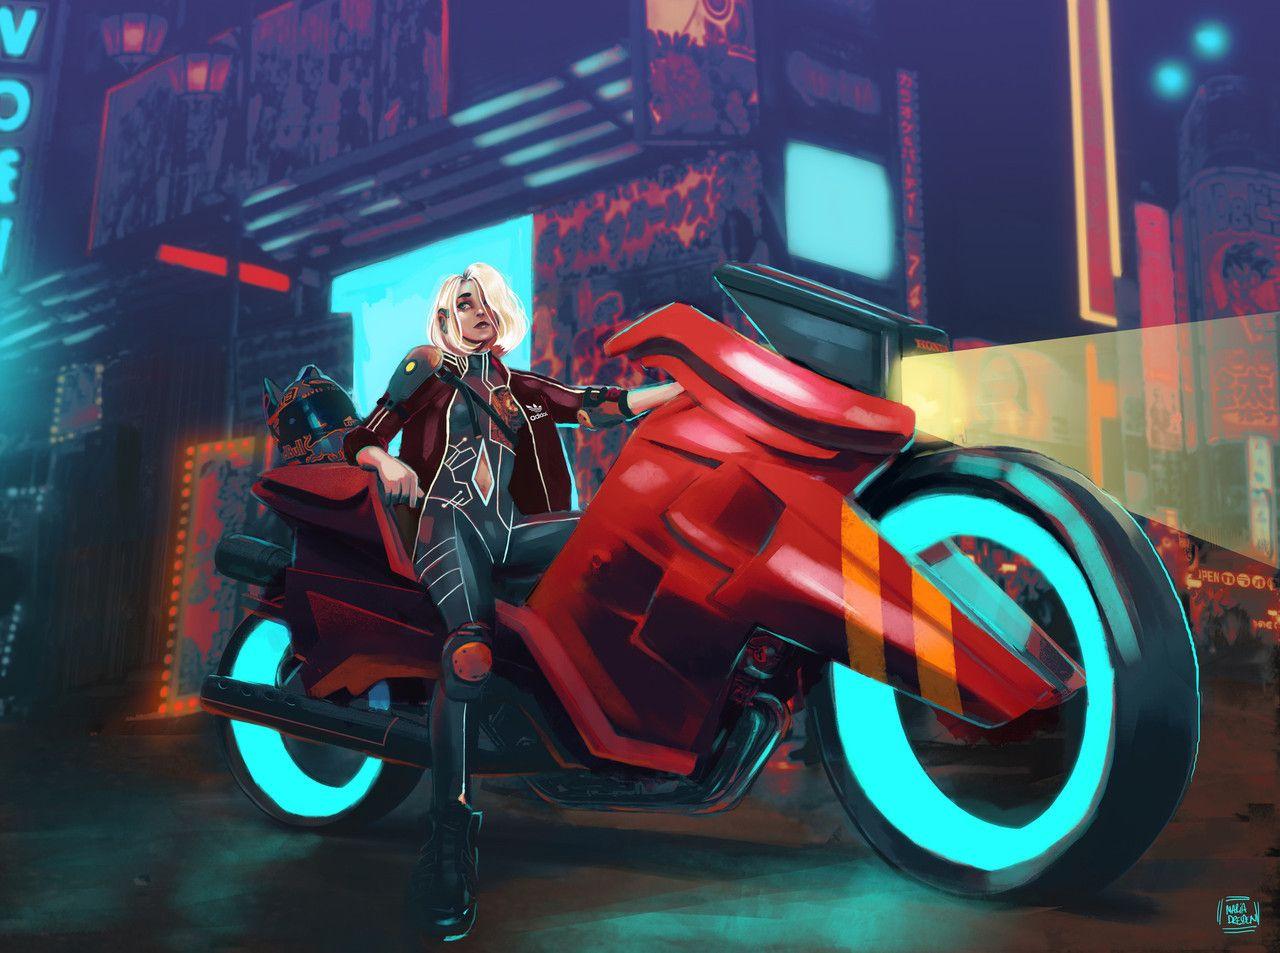 artstation artwork veichle motorbike character